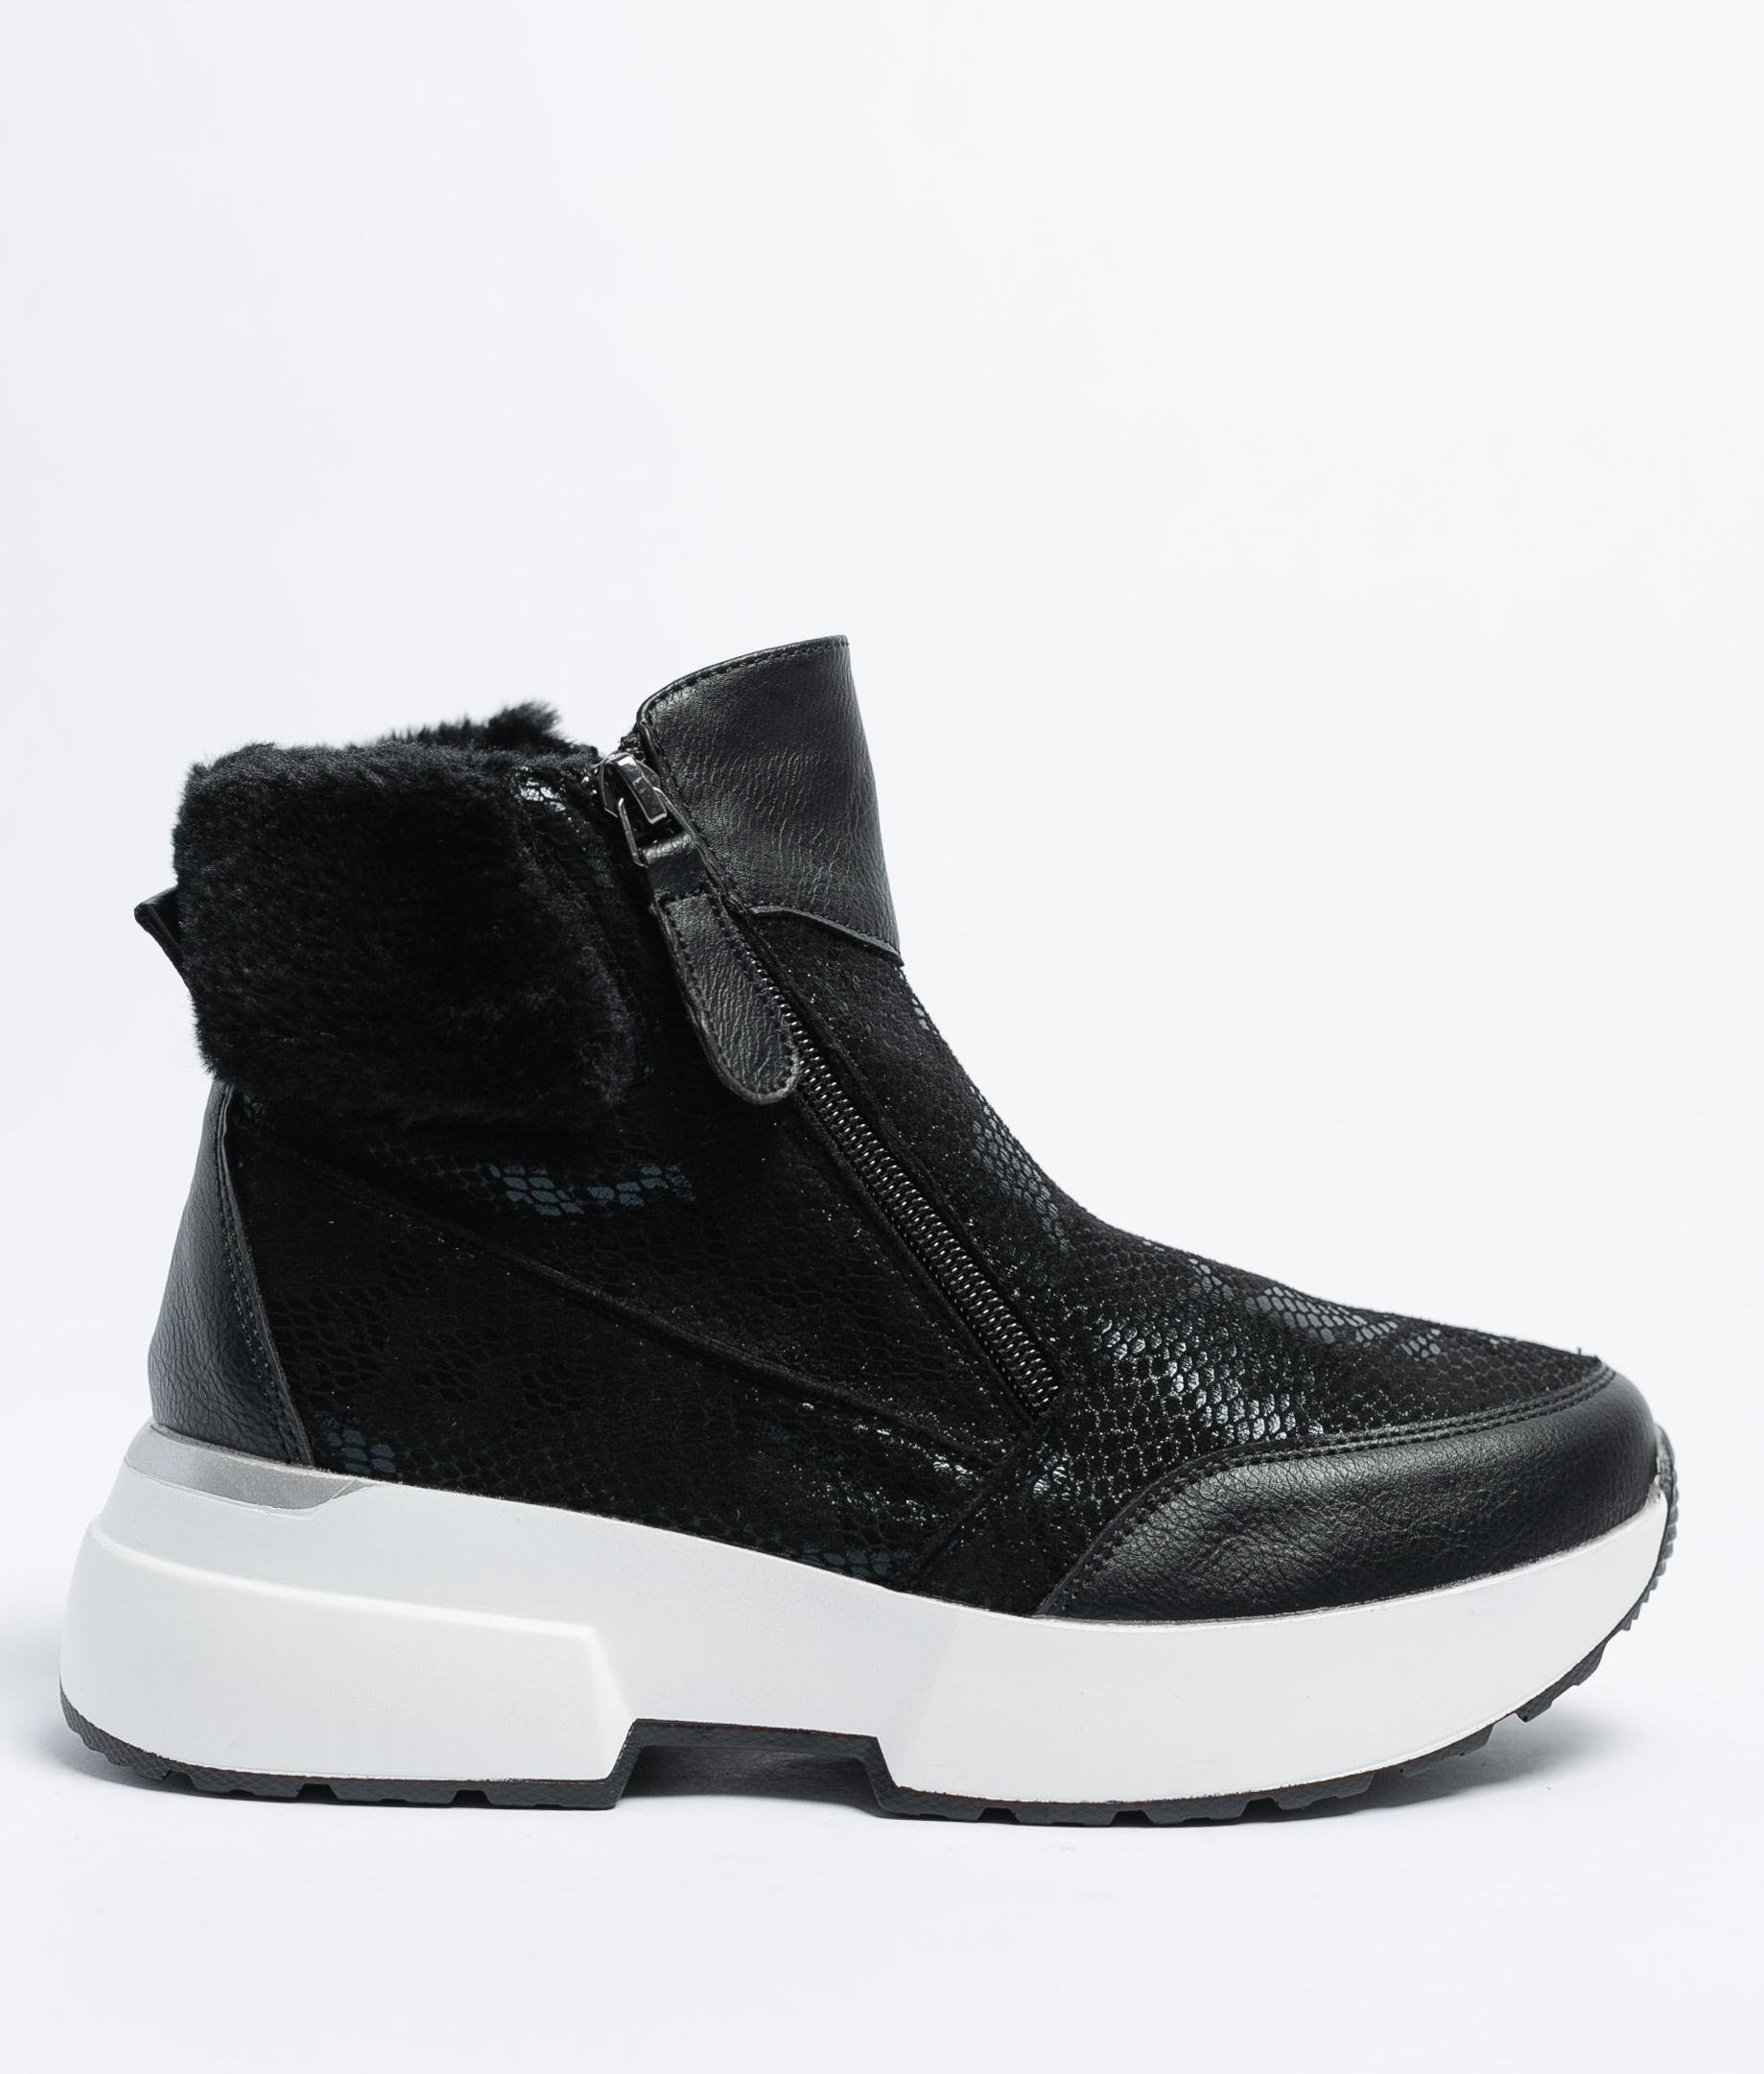 Low boot Yiya - Black